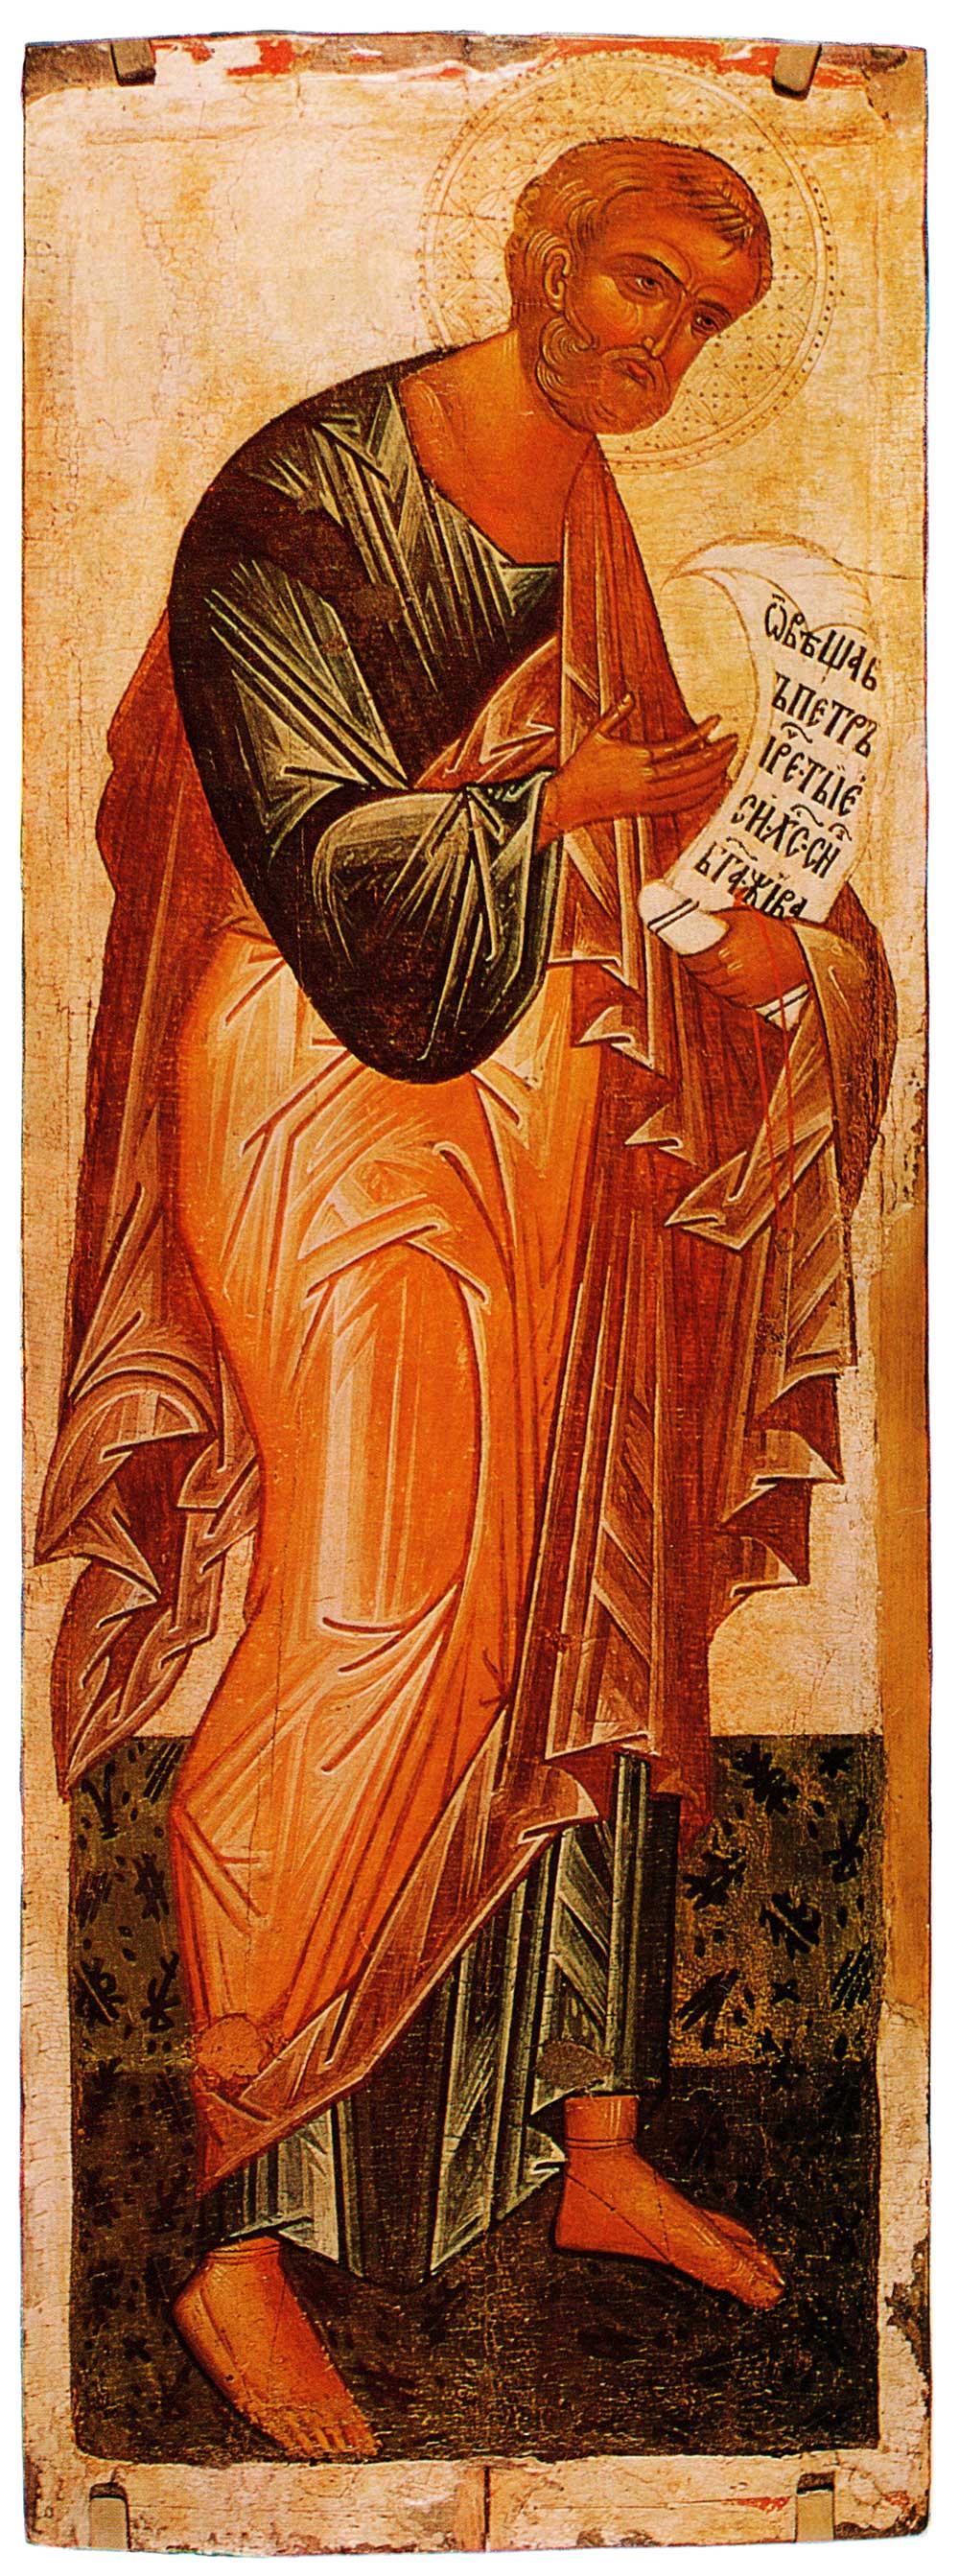 apostol-petr-biografiya